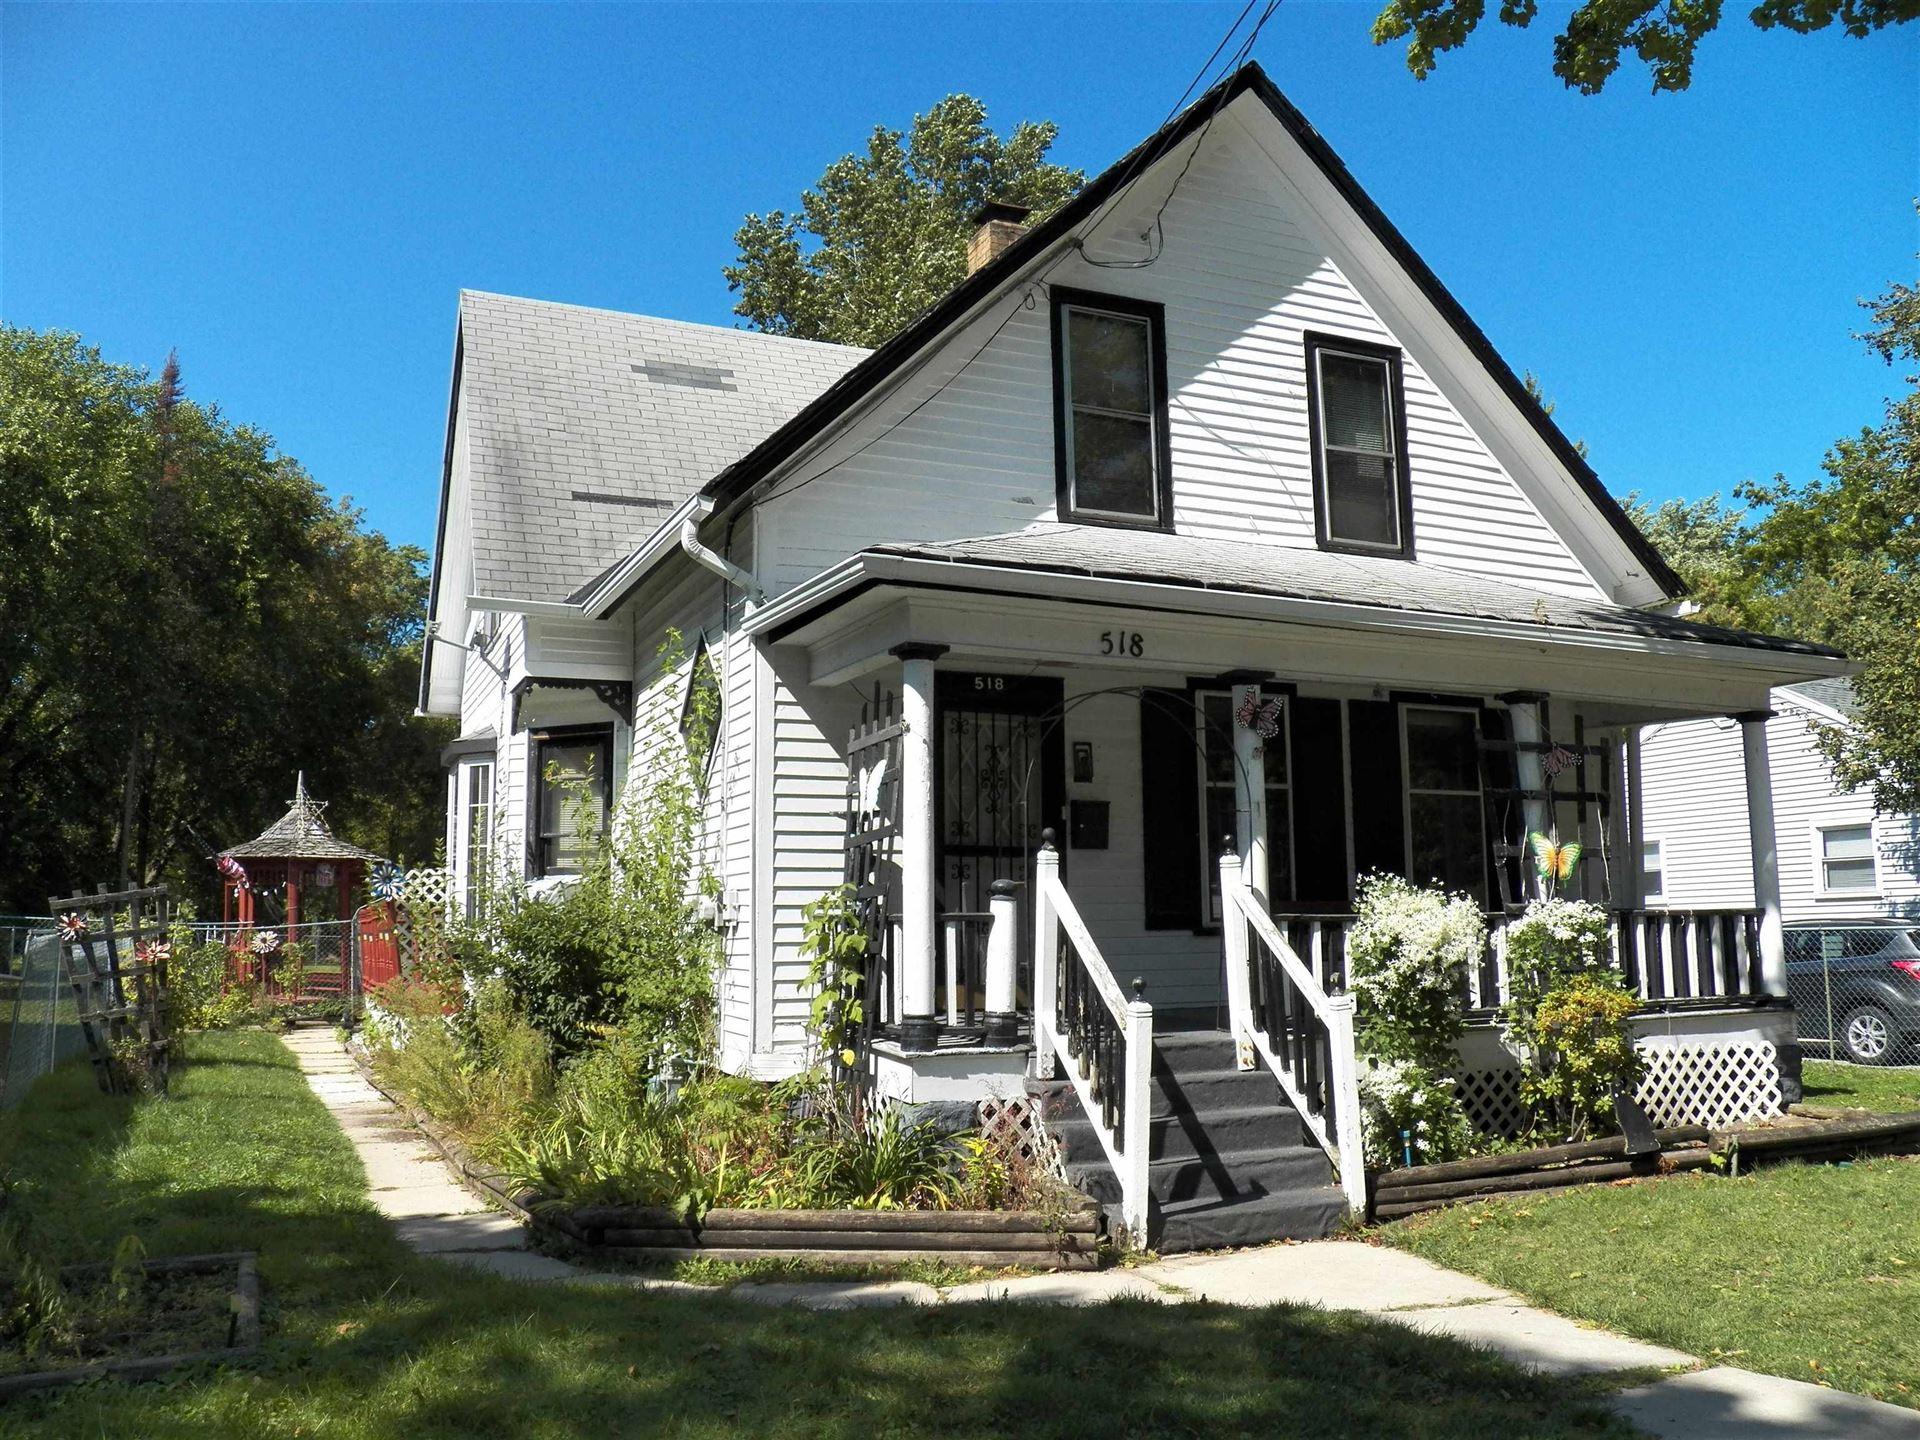 518 GOODELL Street, Green Bay, WI 54301 - MLS#: 50245274